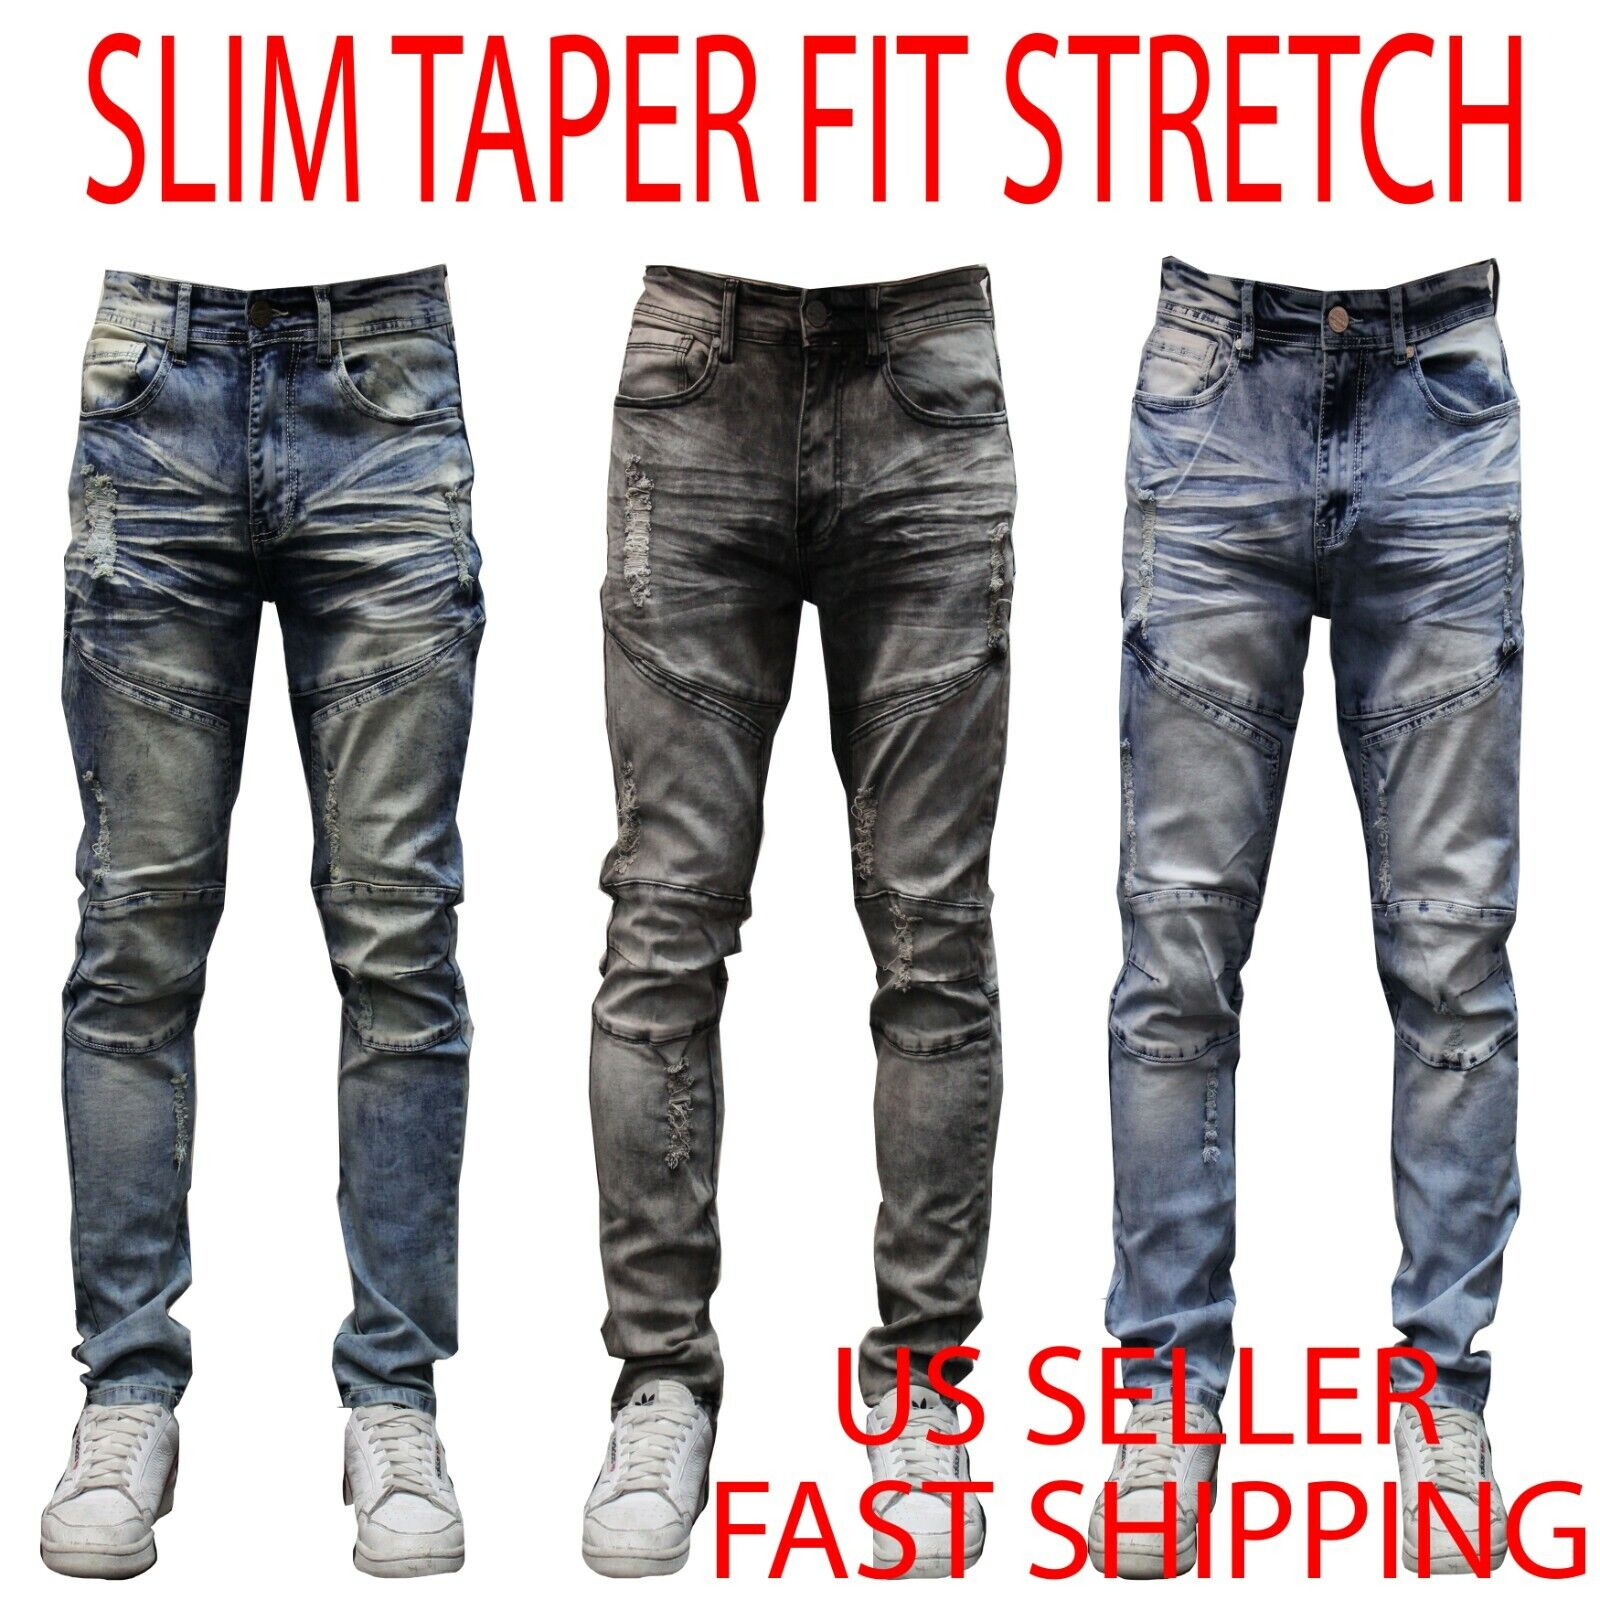 MEN Jeans SLIM FIT TAPERED STRETCH JEAN biker ripped Pants Z